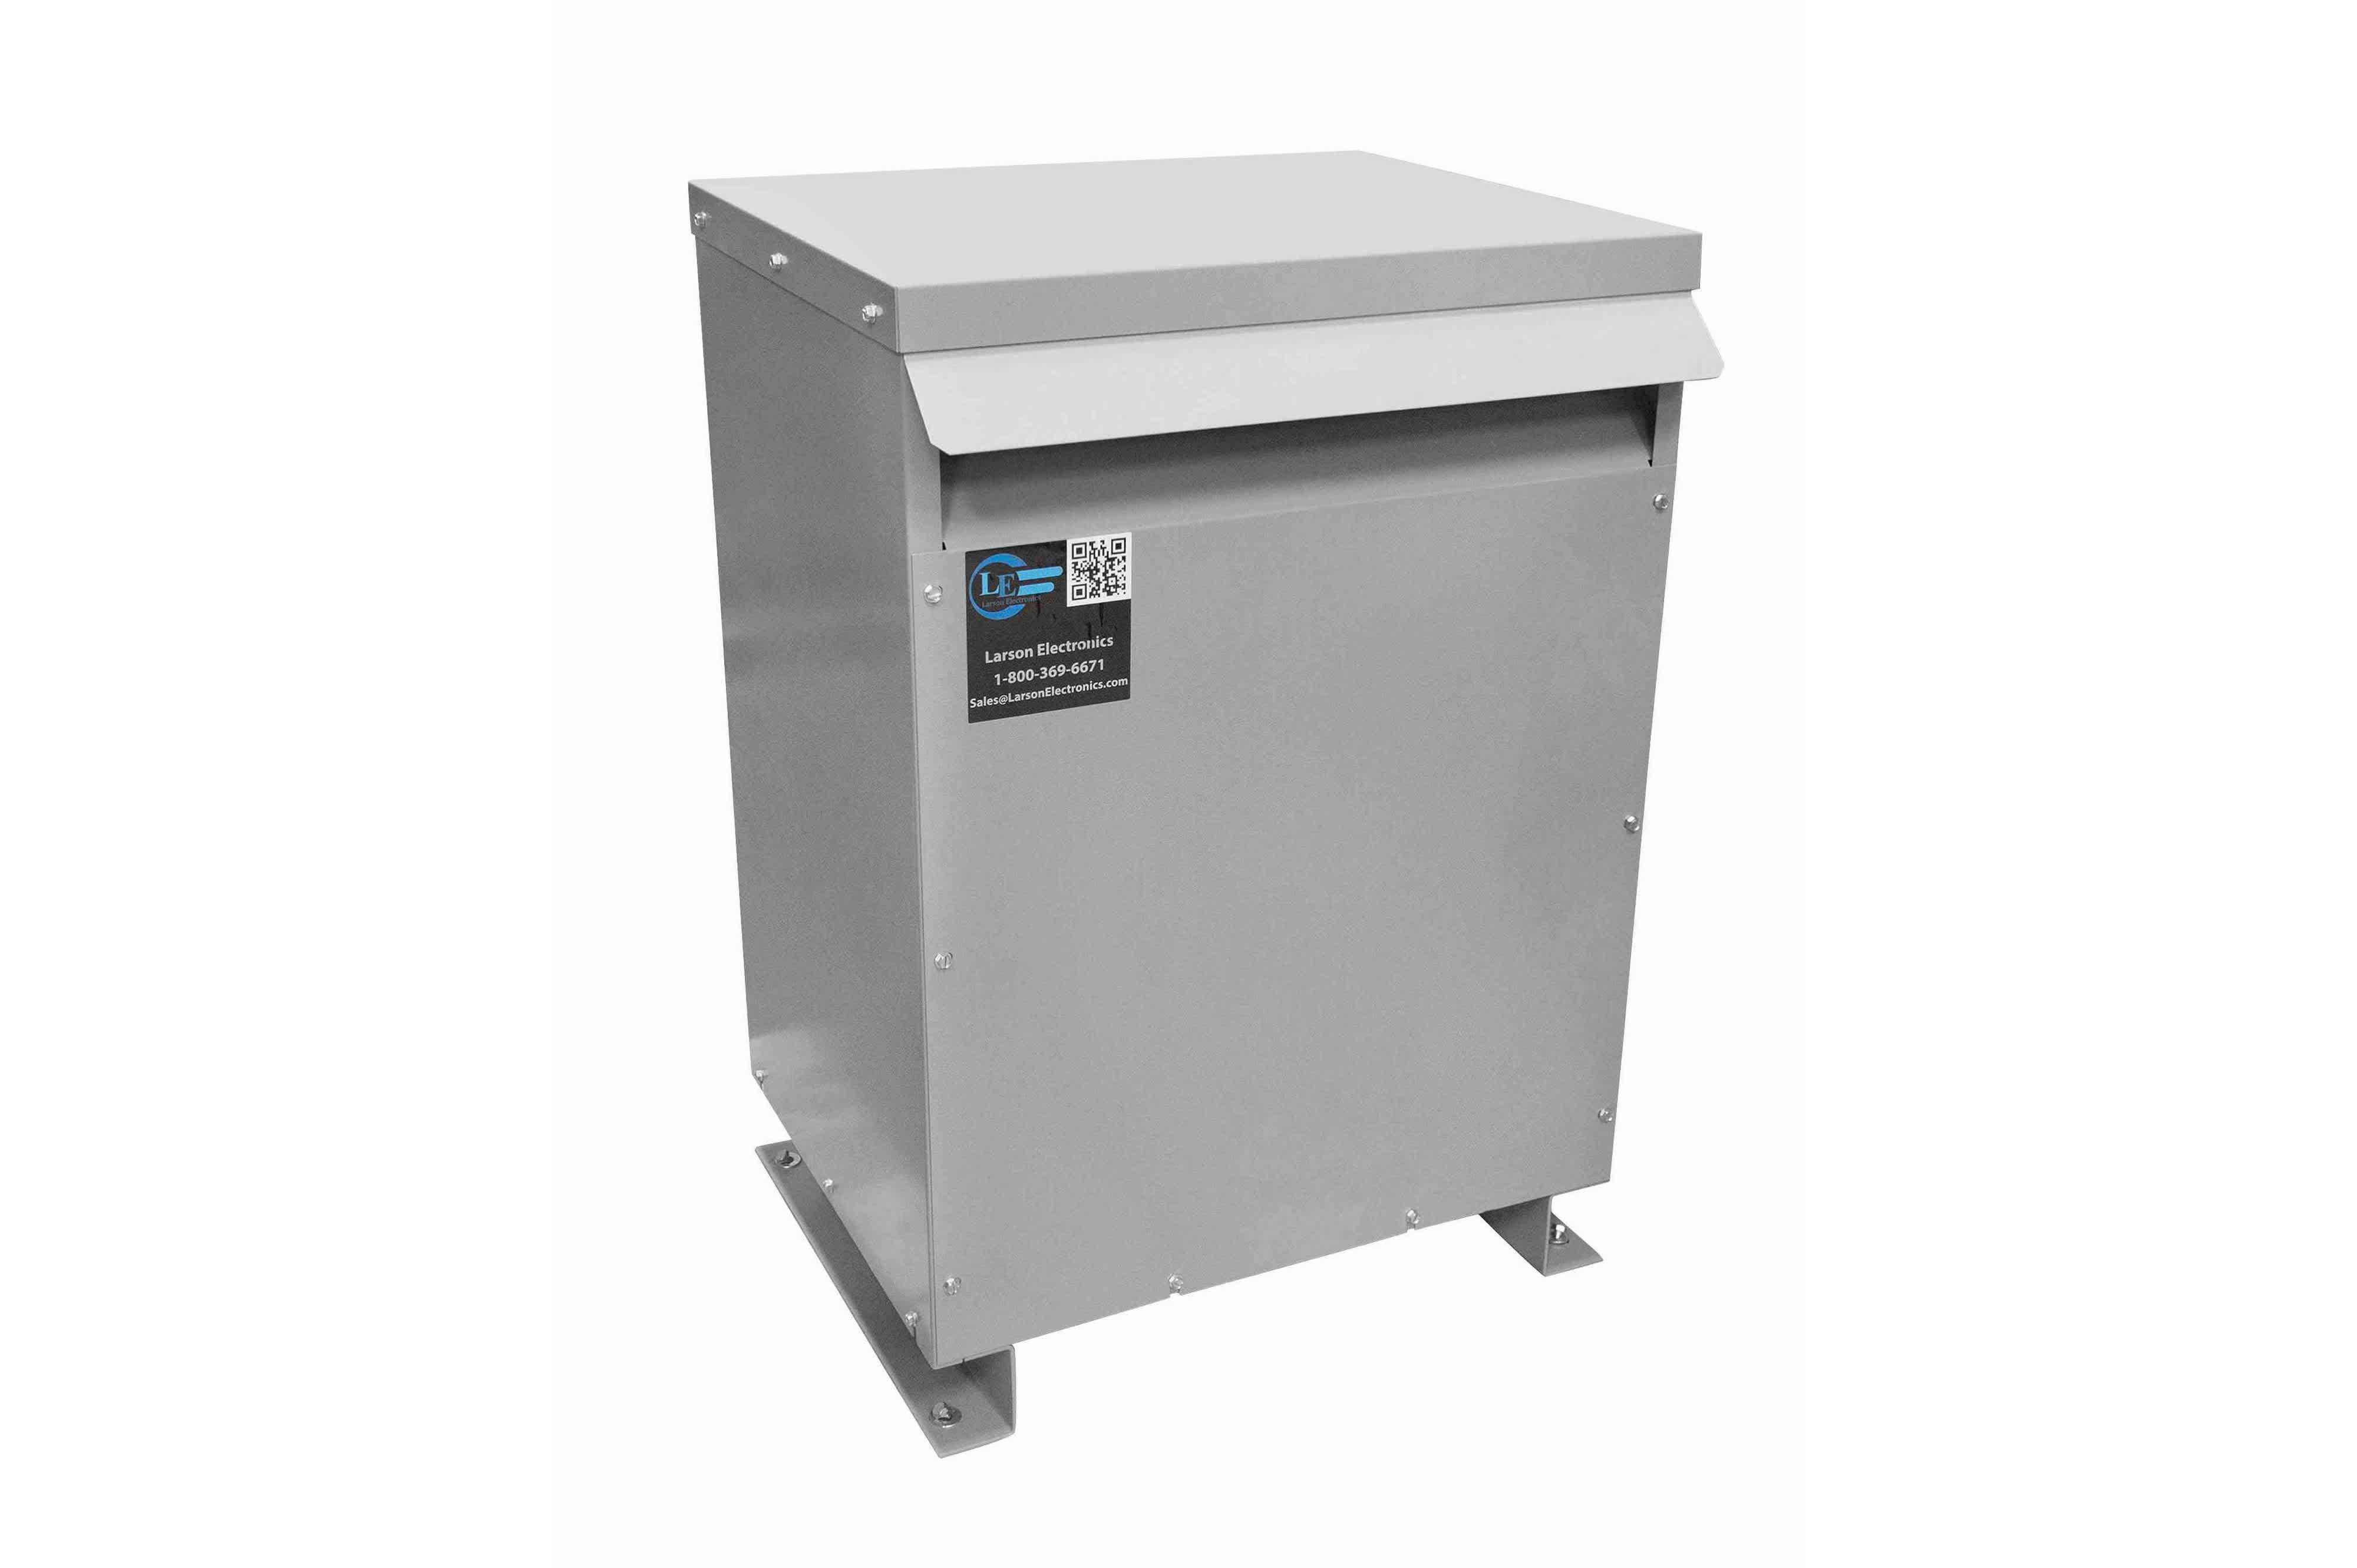 45 kVA 3PH Isolation Transformer, 600V Wye Primary, 415Y/240 Wye-N Secondary, N3R, Ventilated, 60 Hz